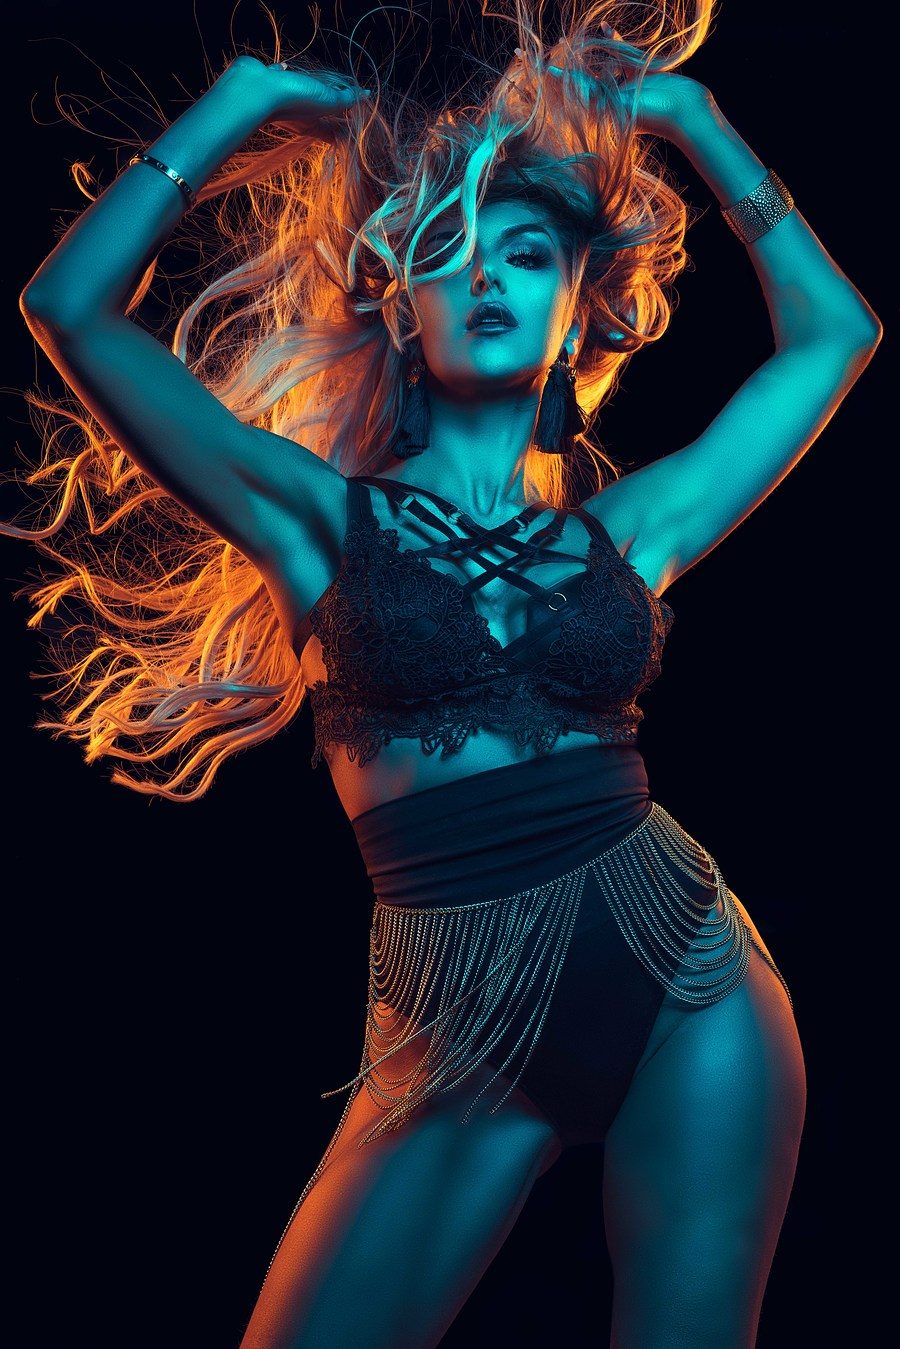 Photography by David Abbs, Model gabriella grigo, Makeup by gabriella grigo / Uploaded 2nd September 2018 @ 06:43 PM